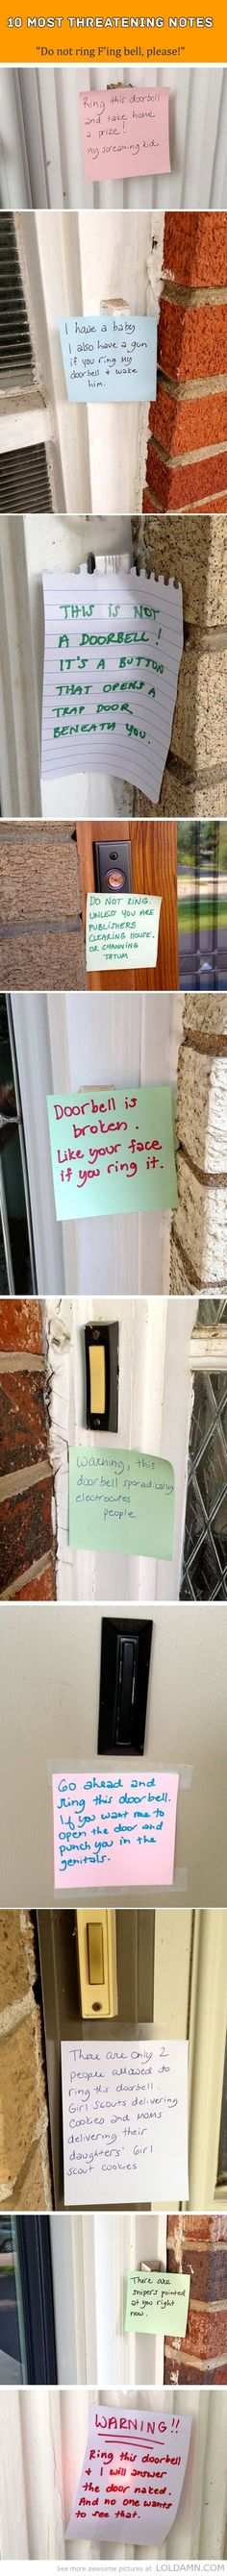 "10 hilarious ""do not ring doorbell"" notes."